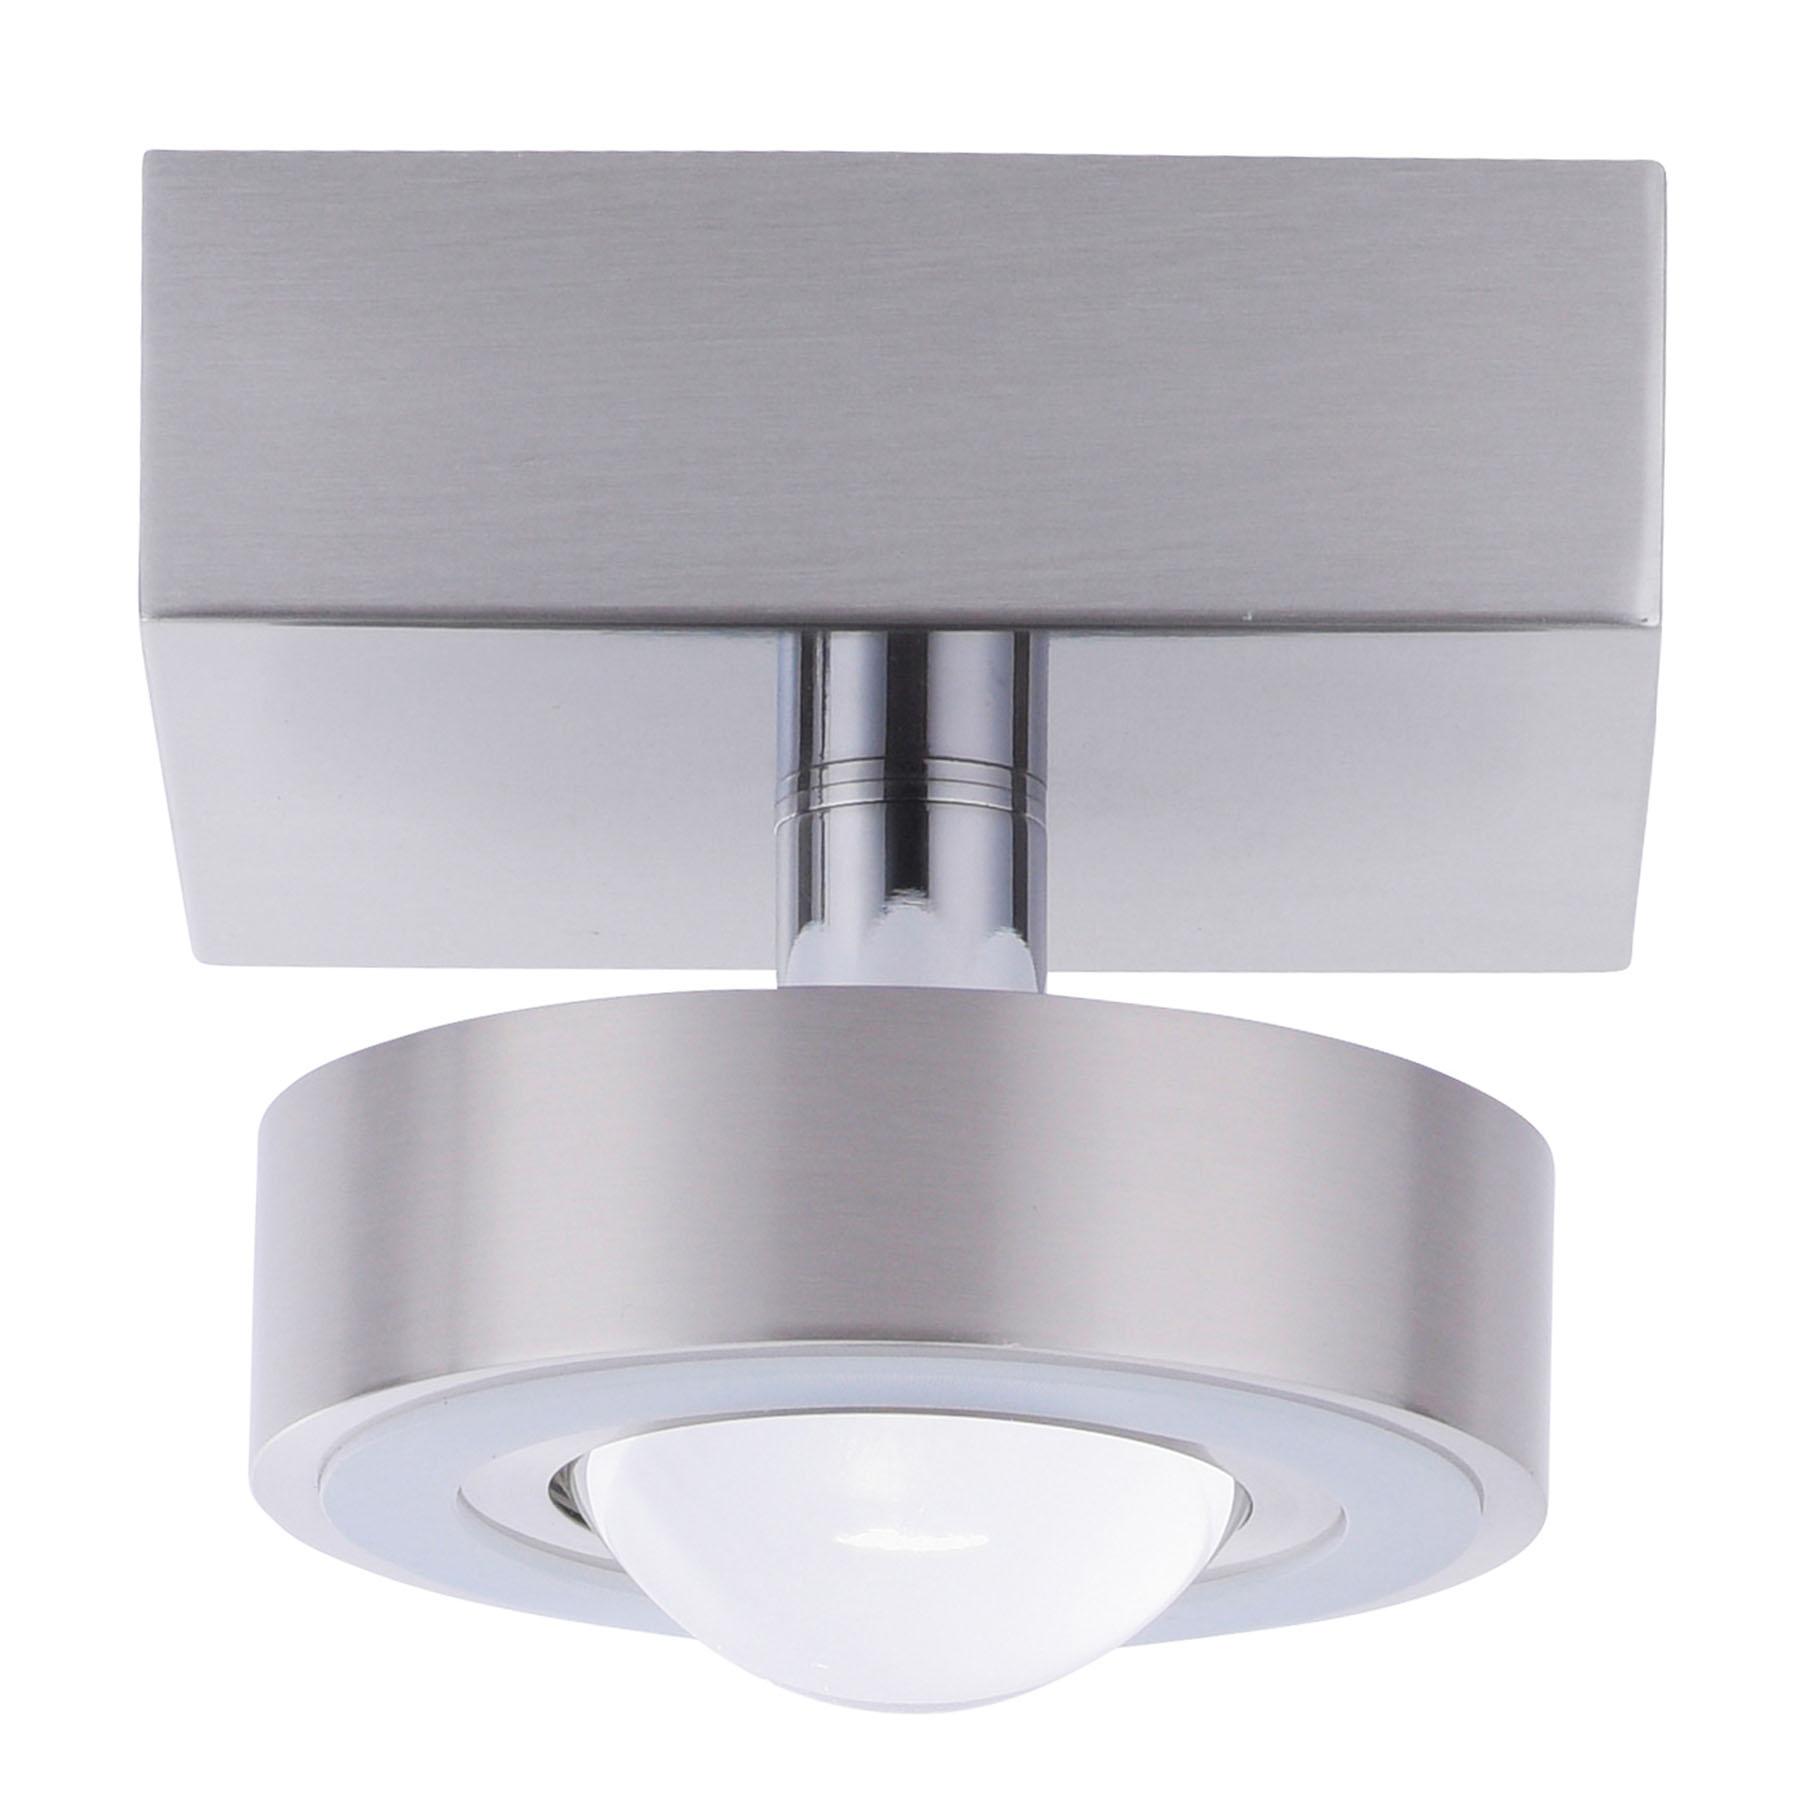 Paul Neuhaus Q-MIA LED-Deckenleuchte stahl